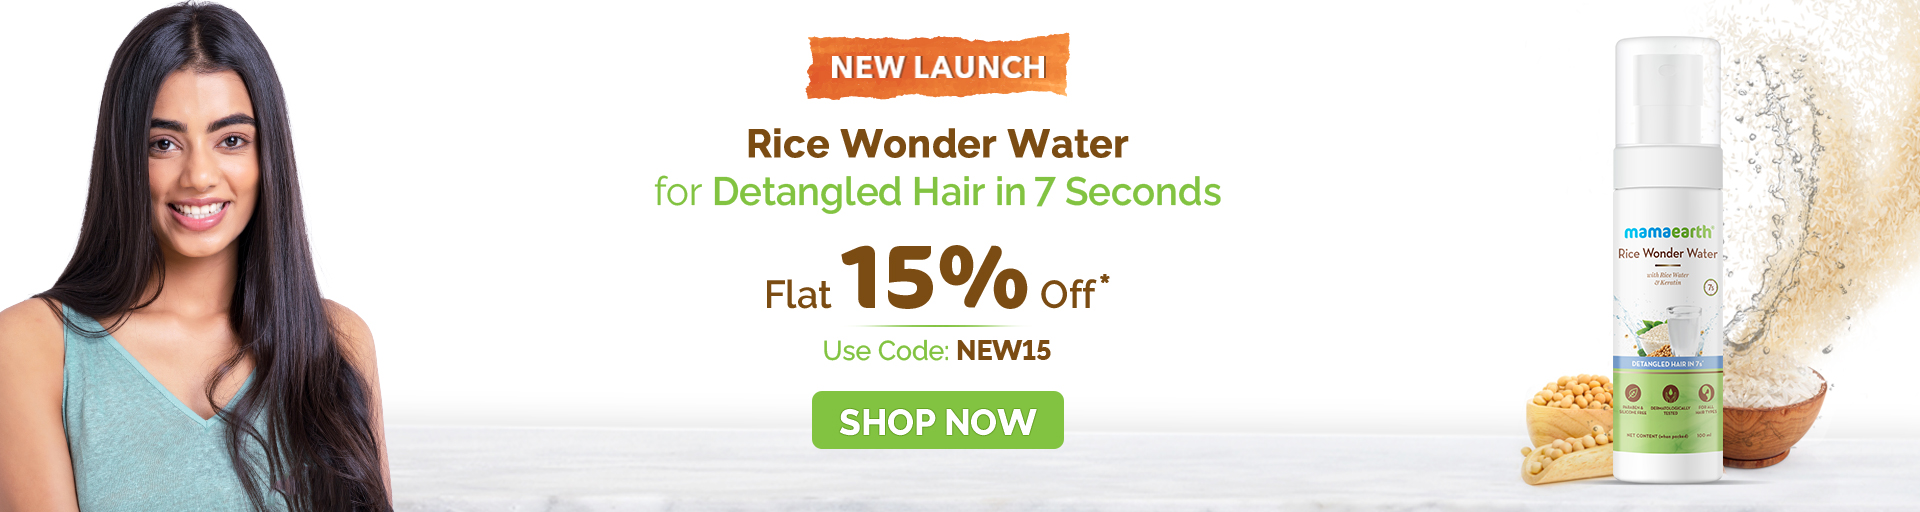 Rice wonder water